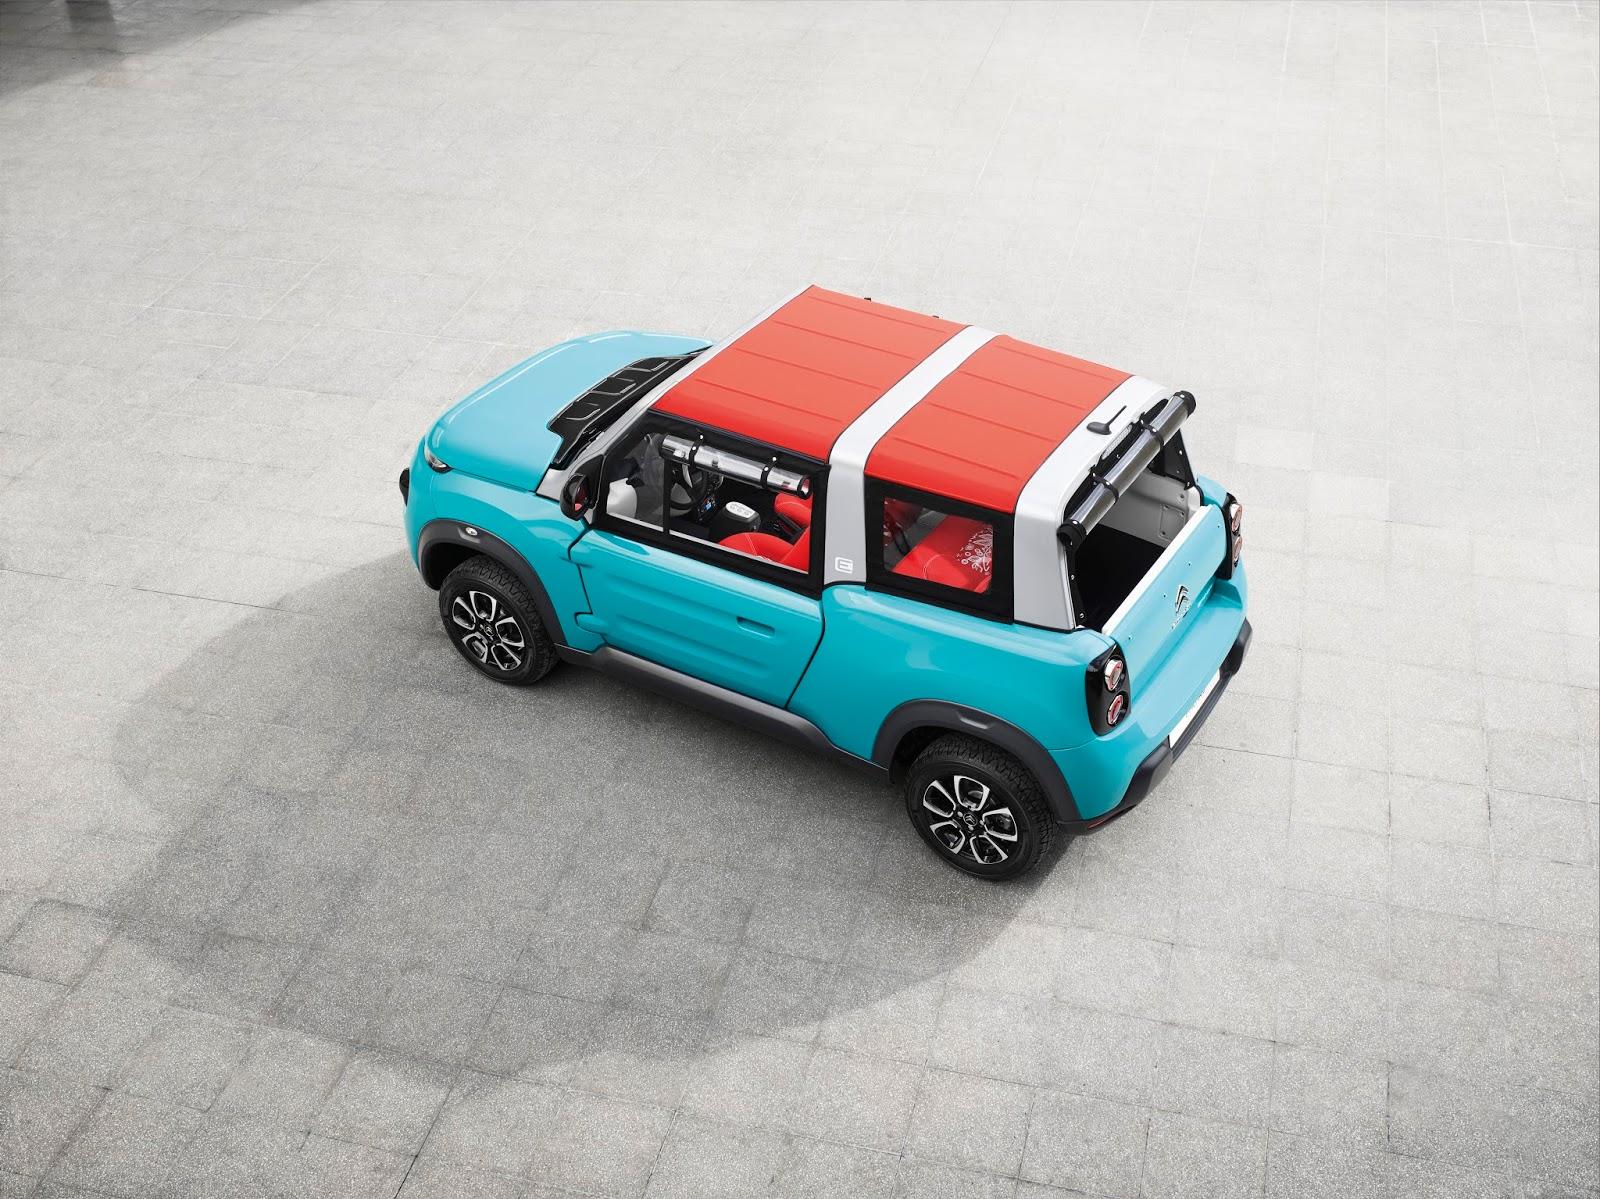 CL%2B16.005.014 Με 5 Παγκόσμιες Πρεμιέρες η Citroën Στο Σαλόνι Αυτοκινήτου της Γενεύης